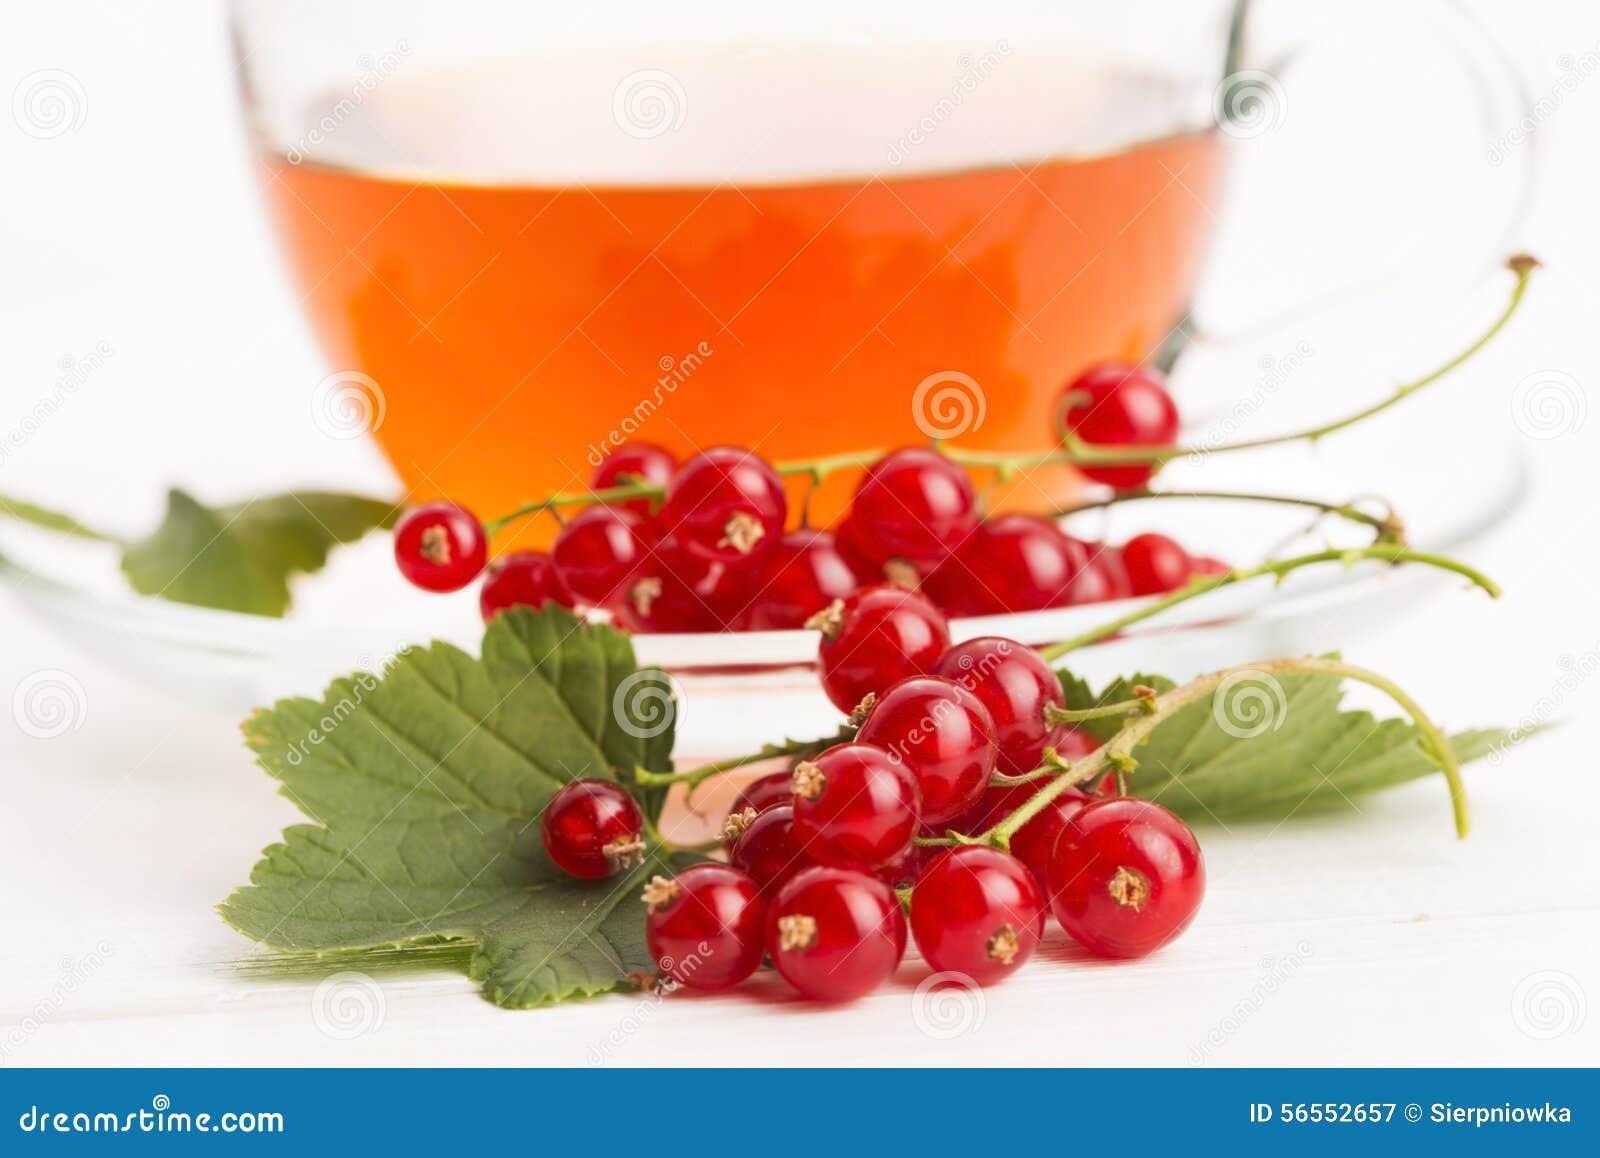 Download Τσάι στο φλυτζάνι και τη φρέσκια κόκκινη σταφίδα Στοκ Εικόνα - εικόνα από ώριμος, ξινίστε: 56552657